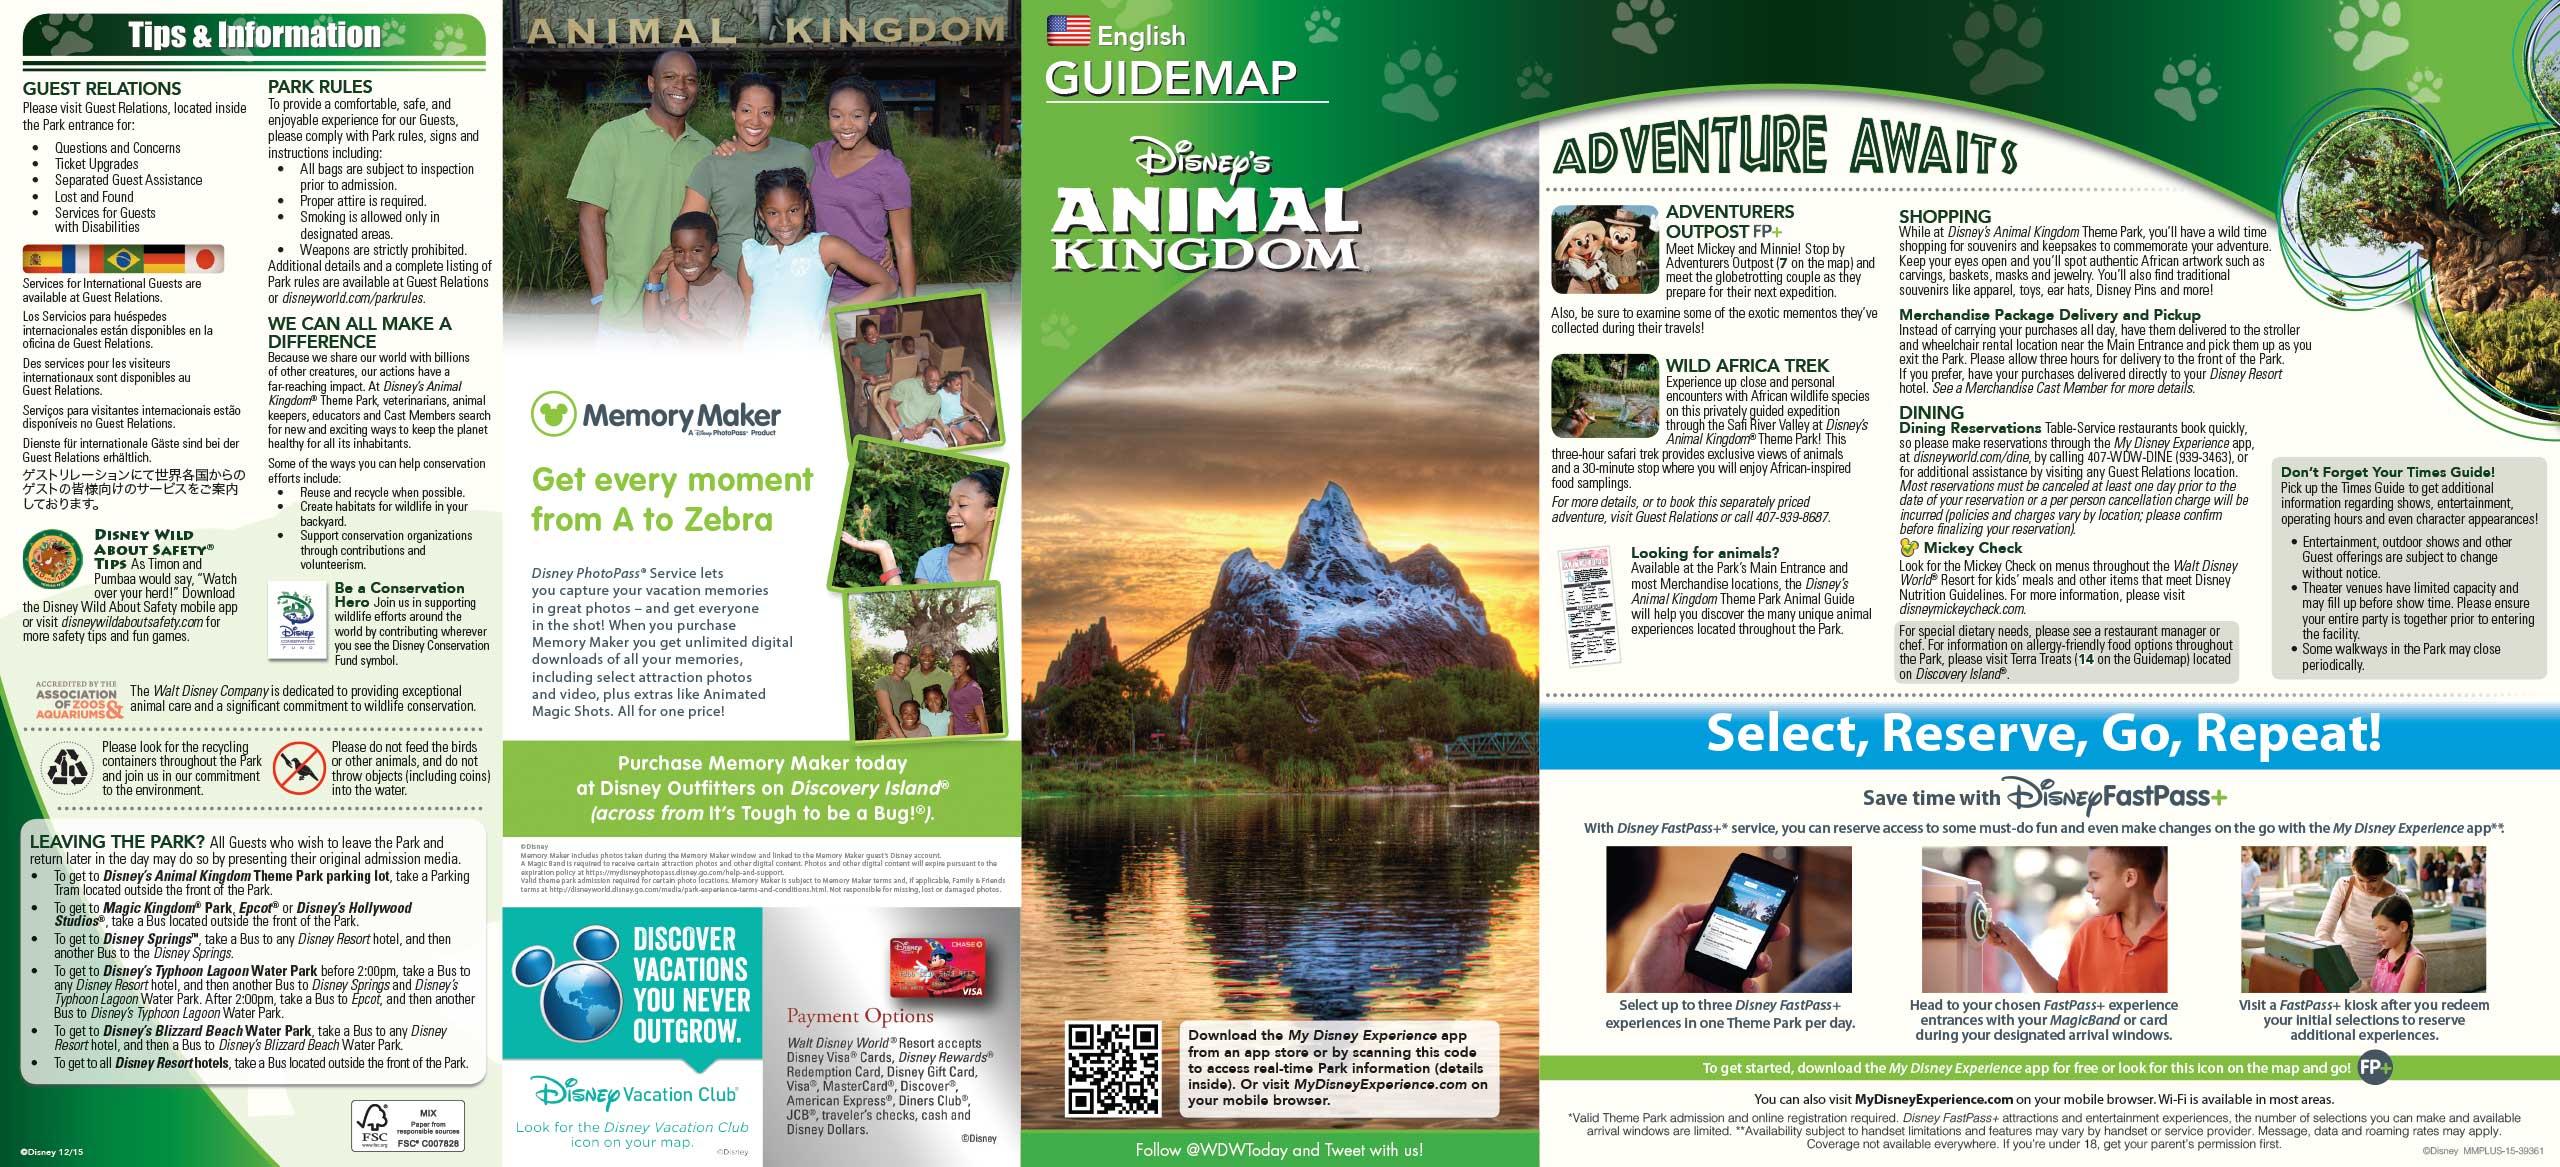 January 2016 Walt Disney World Park Maps